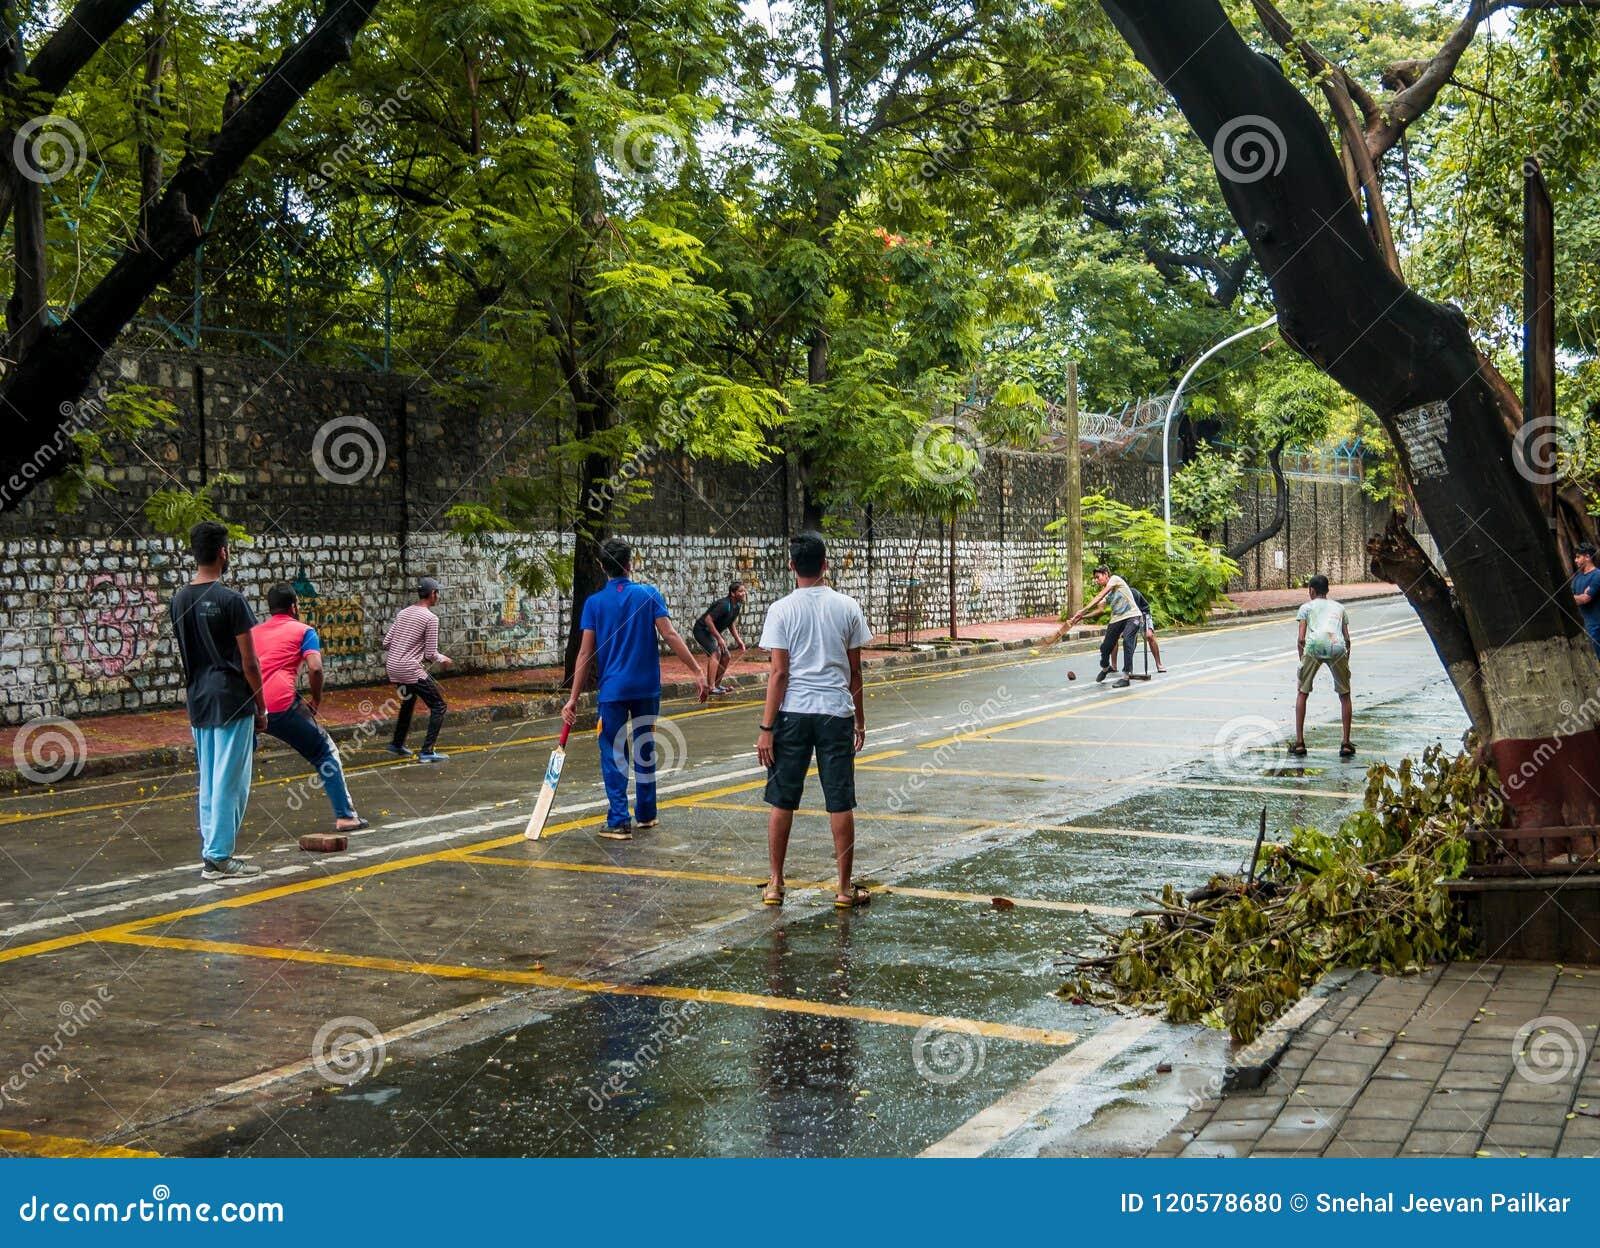 boys playing cricket on streets at ballard estate, south mumbai